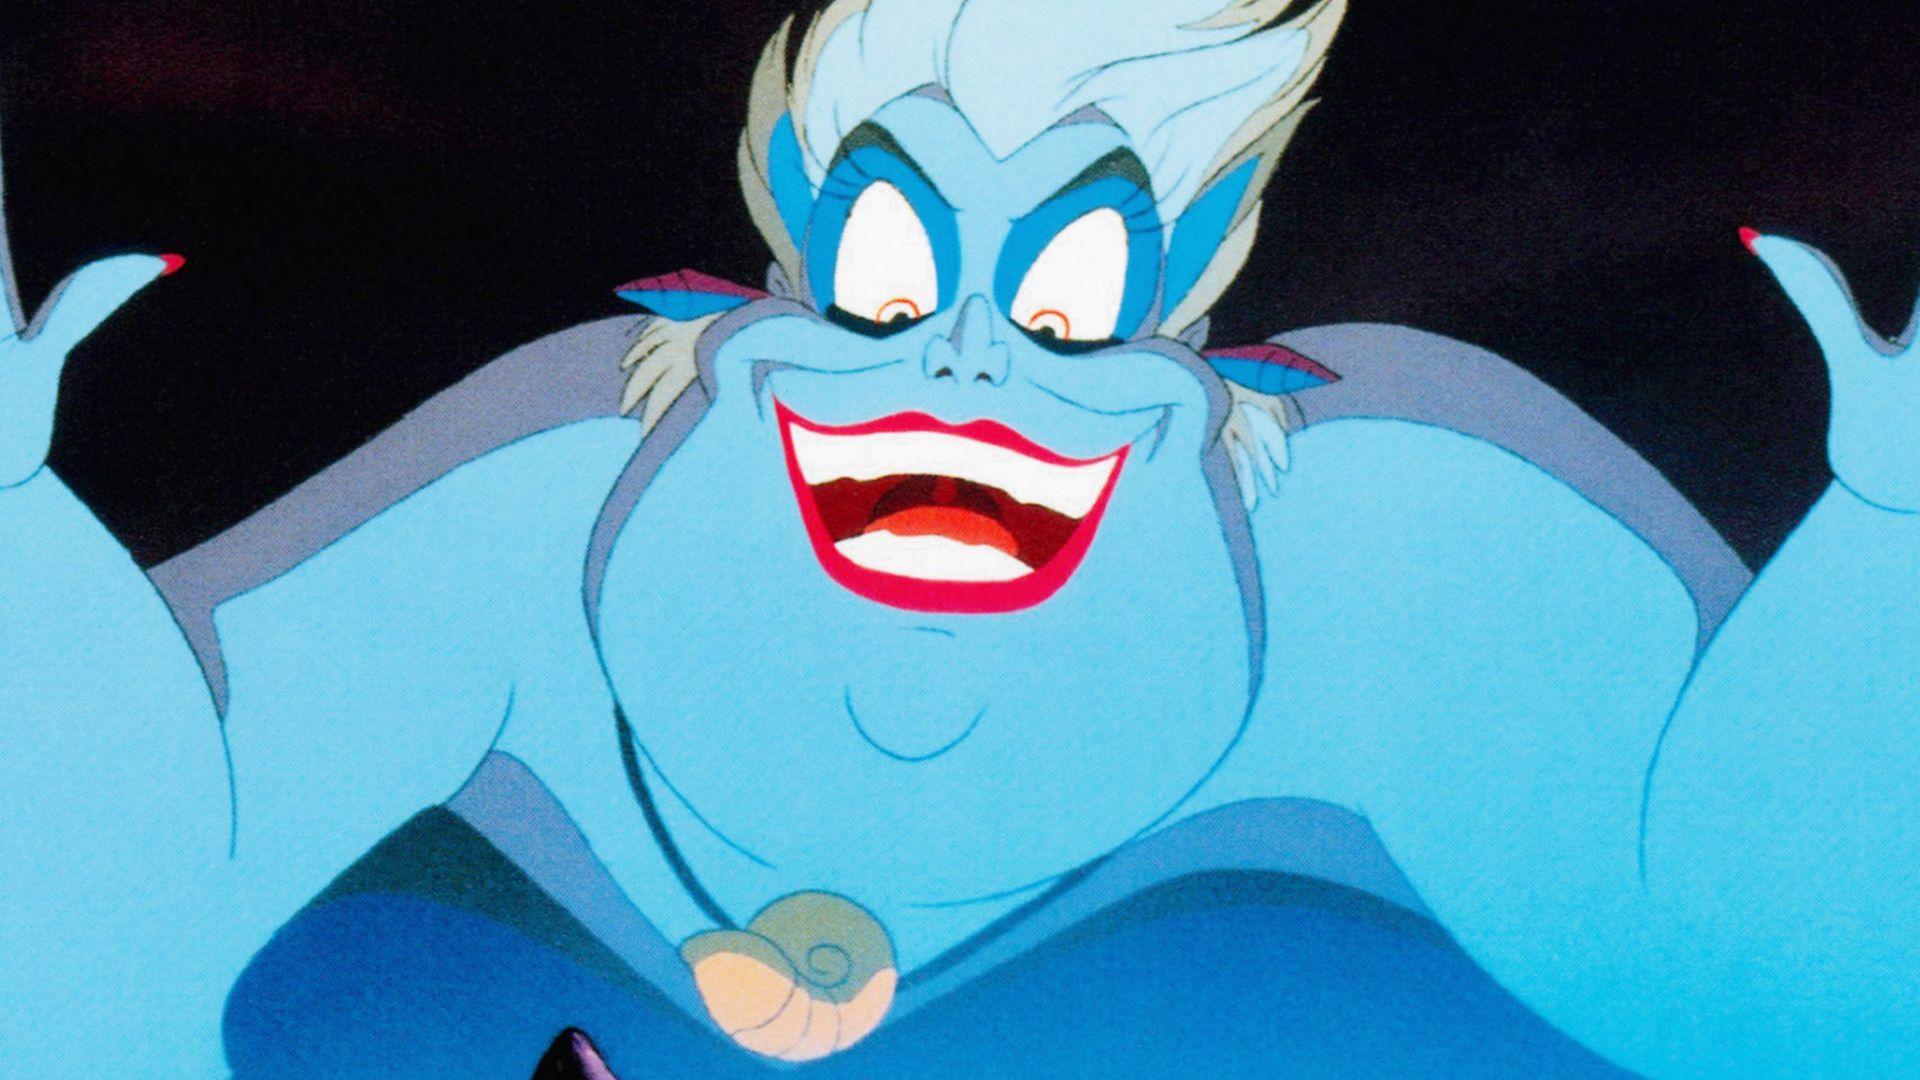 Disneys Arielle Alyssa Milano Stand Damals Modell Promiflash De